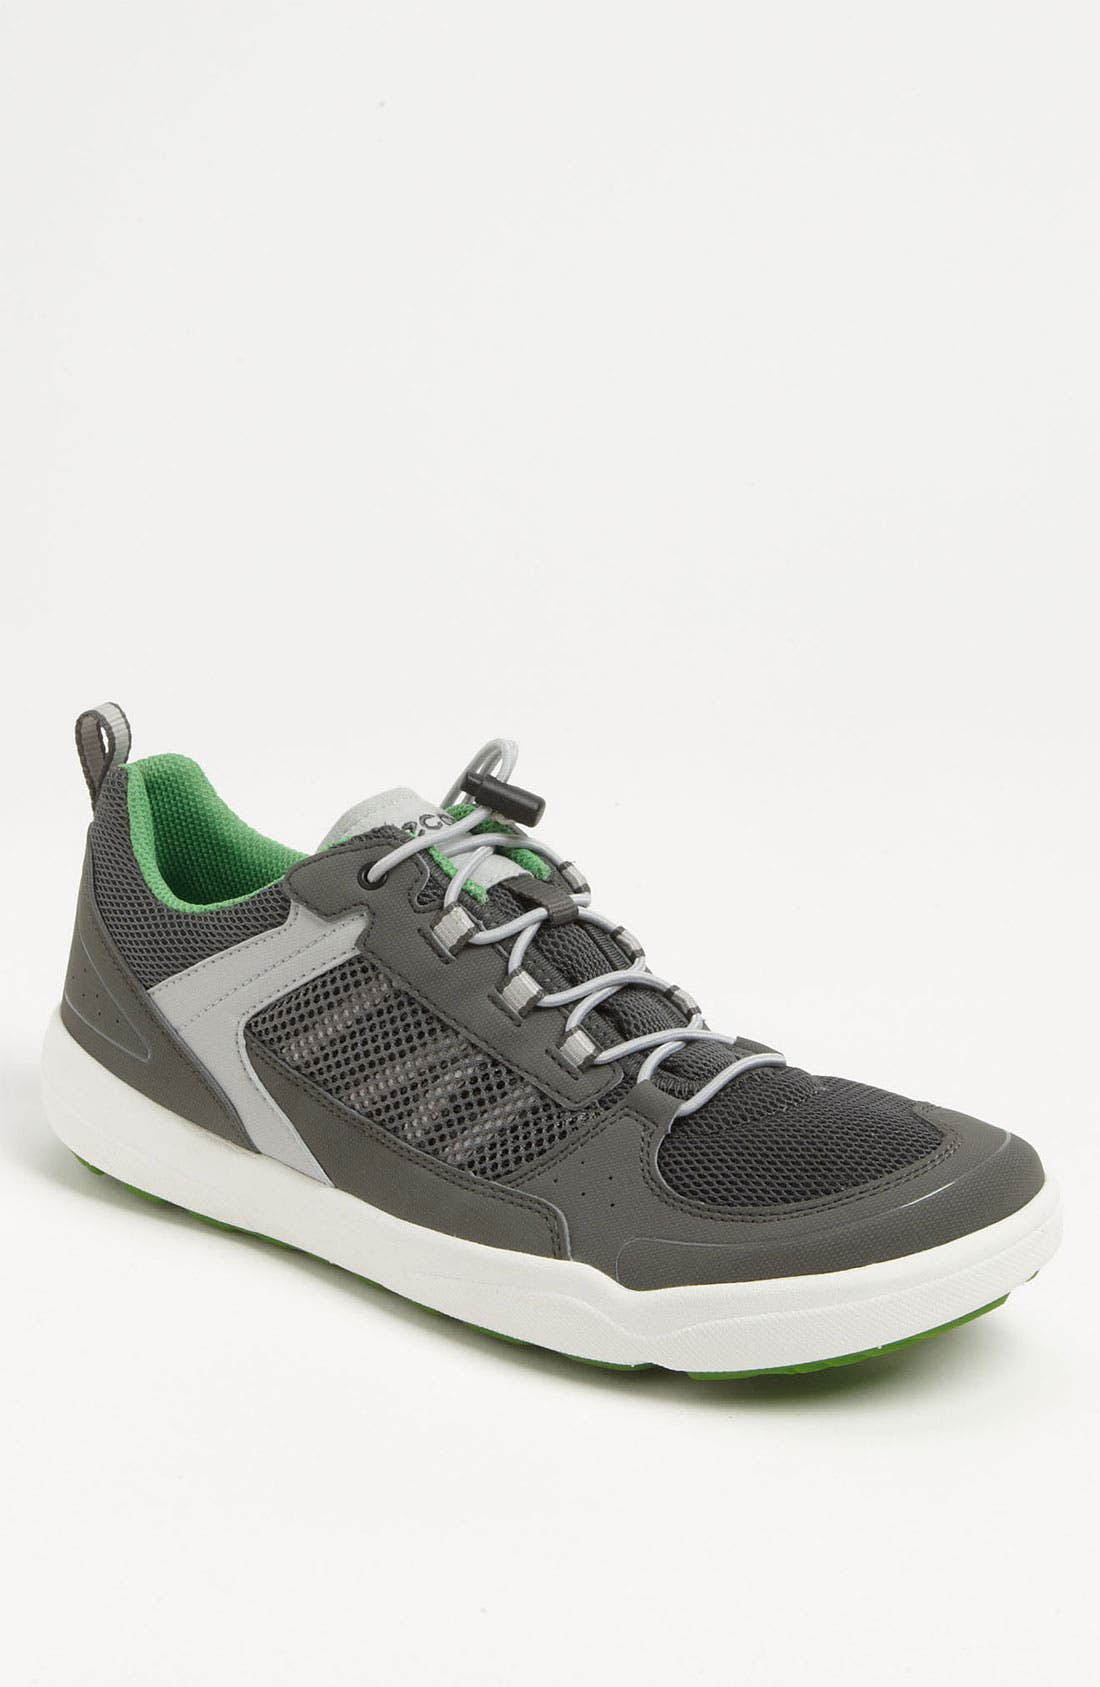 Main Image - ECCO 'Njord' Sneaker